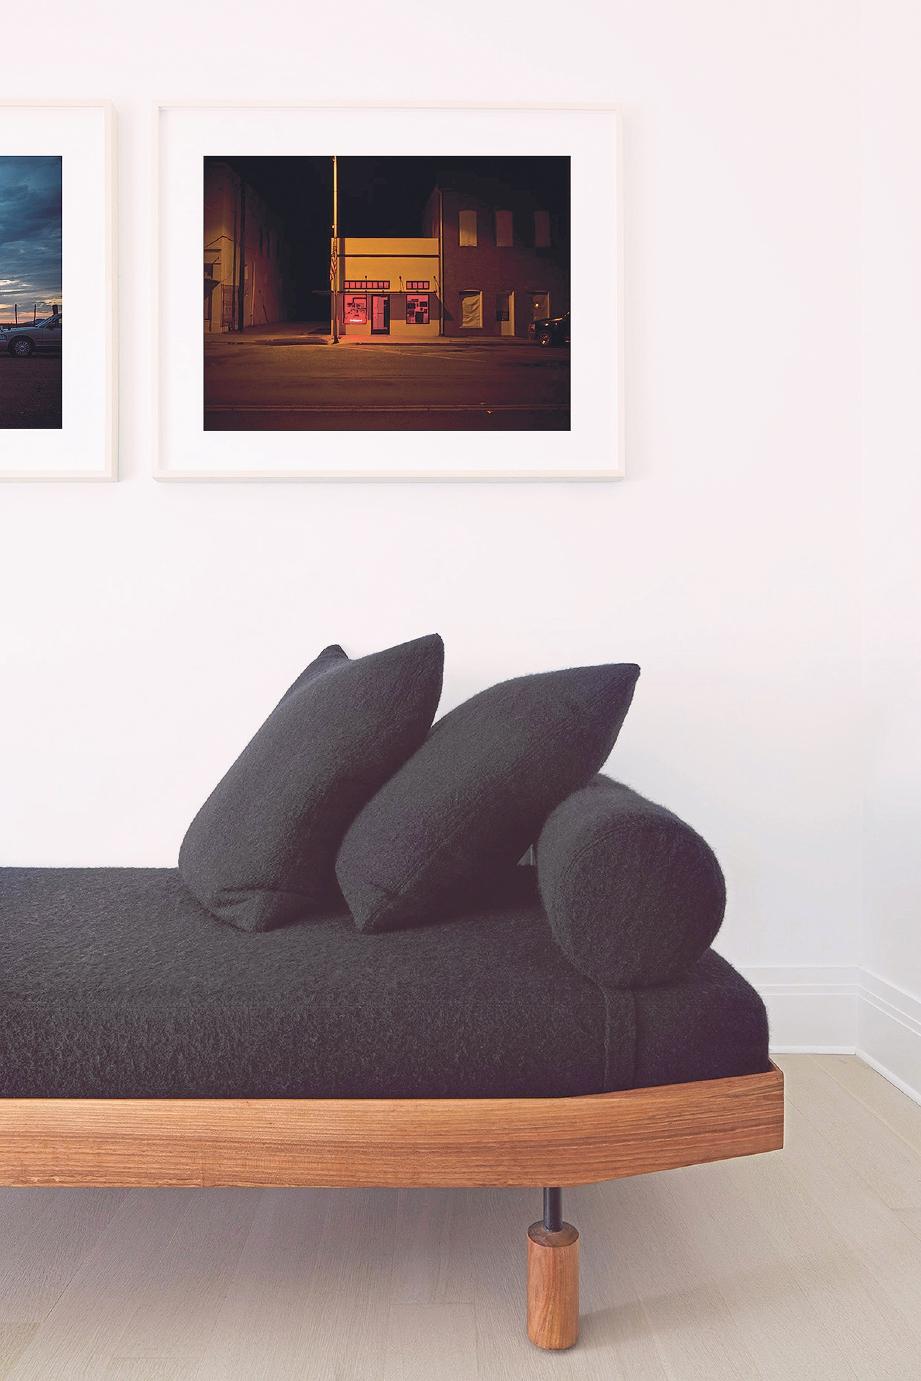 TEMPAT istirahat dilengkapi kerusi vintaj kayu walnut dengan kusyen hitam.